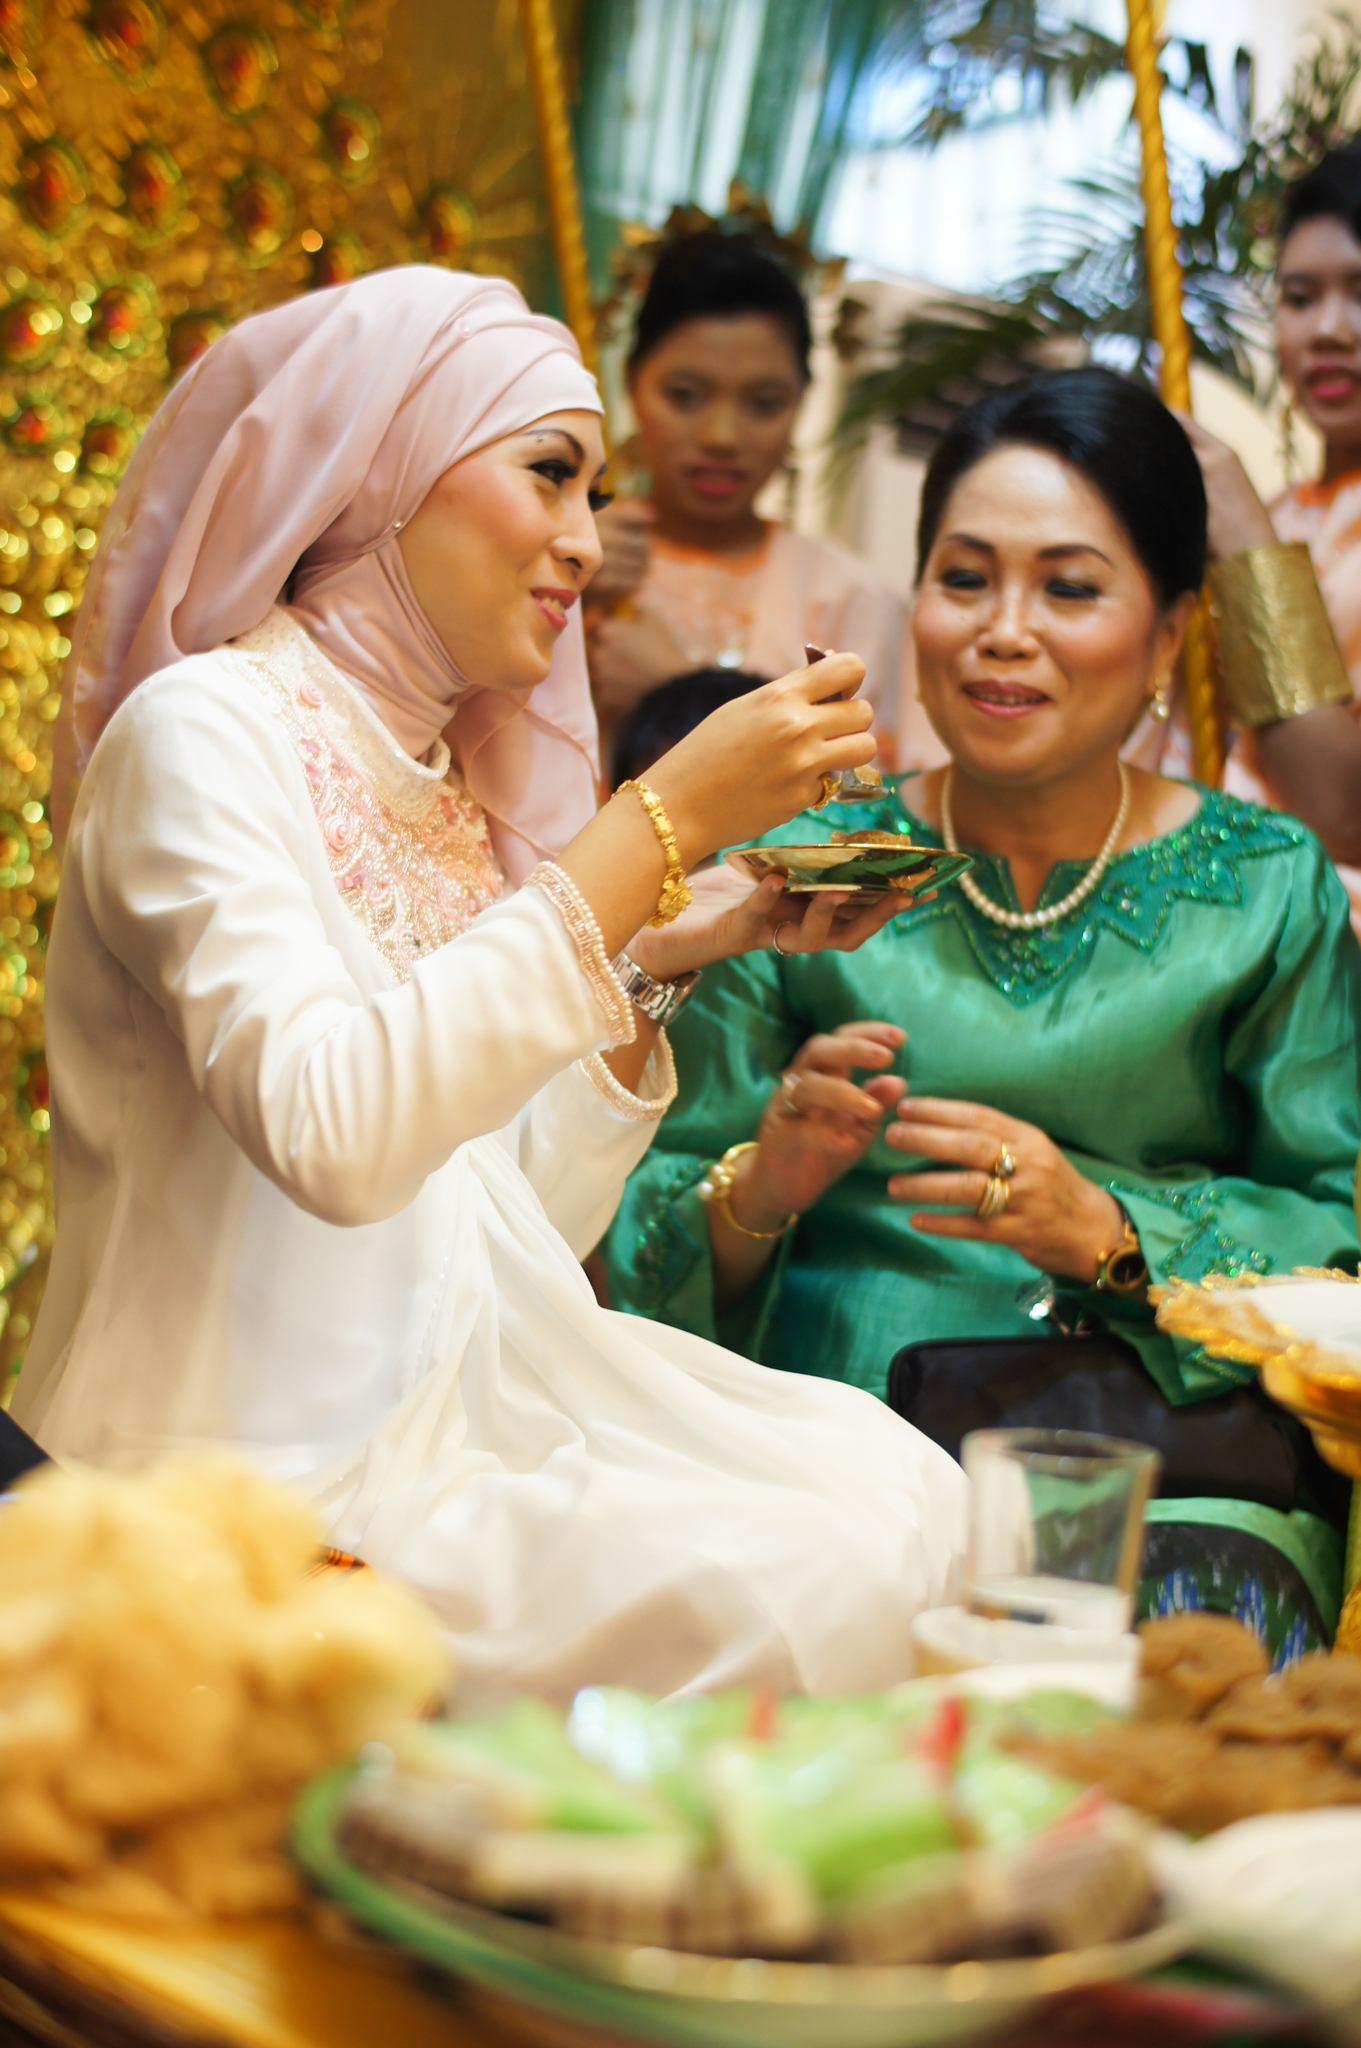 Bride feeding her mother.